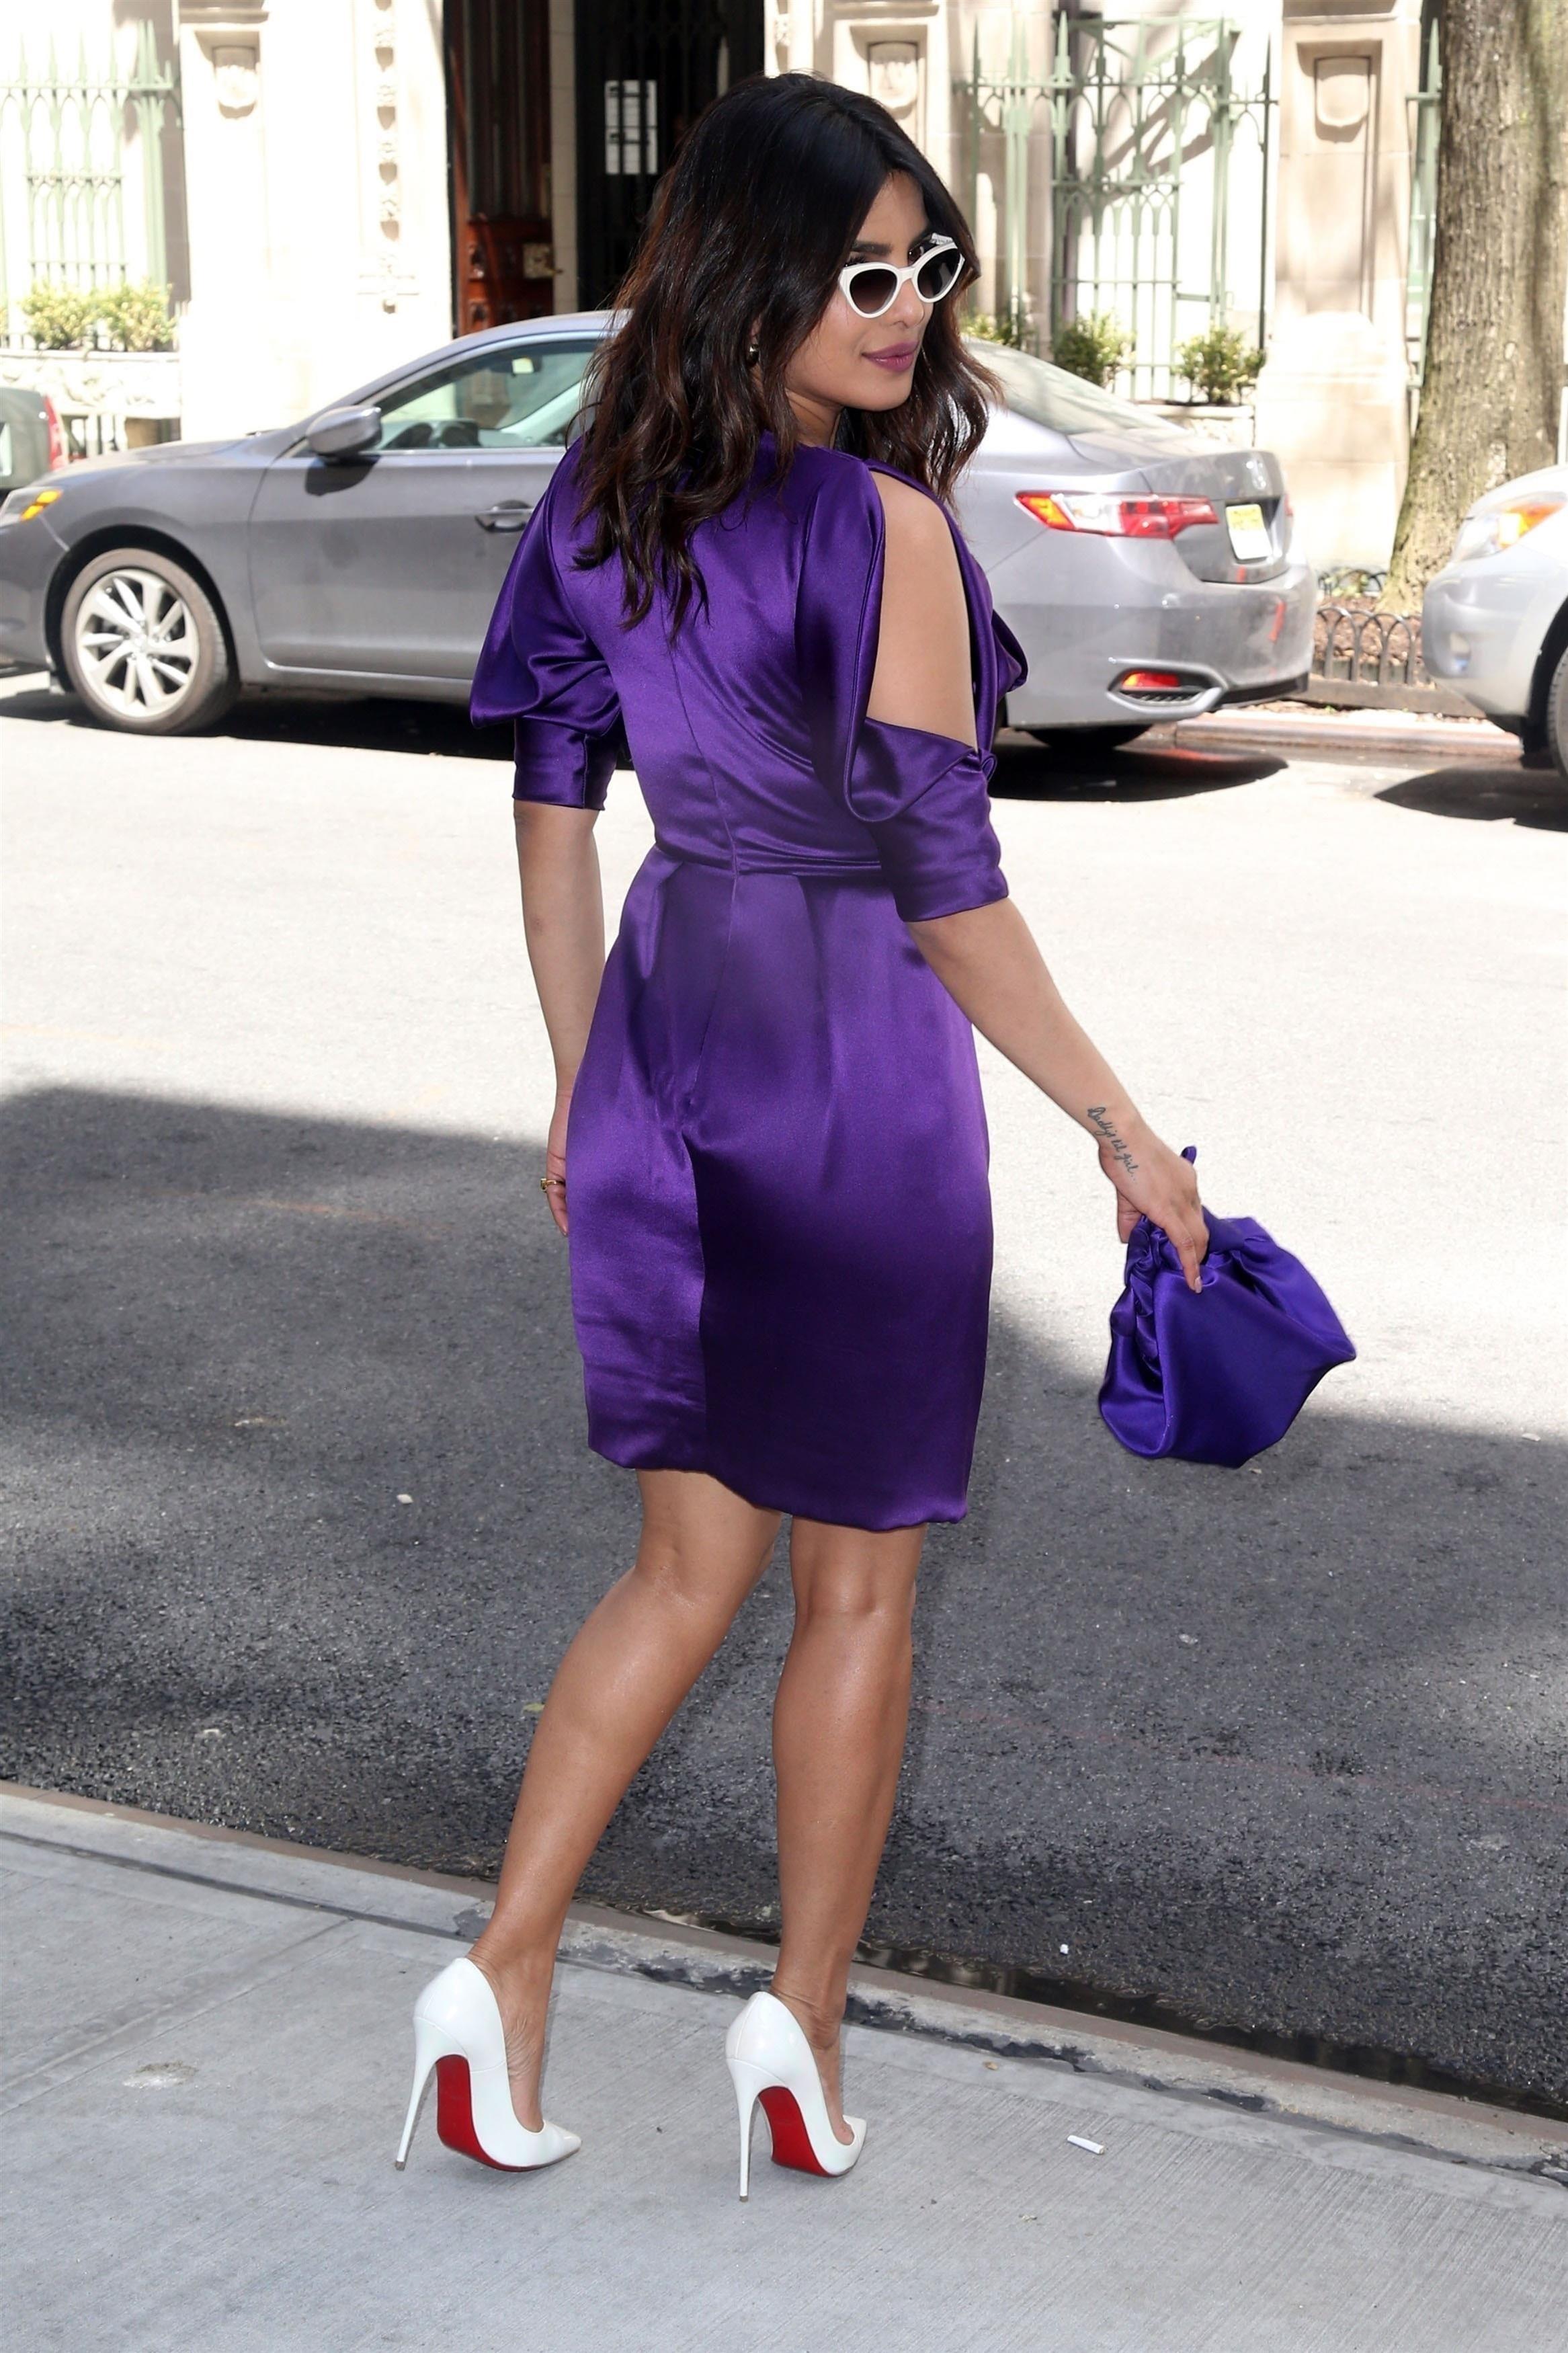 59208cd8fd1d Only in High Heels. Celebrity women revealing their sexy legs ...